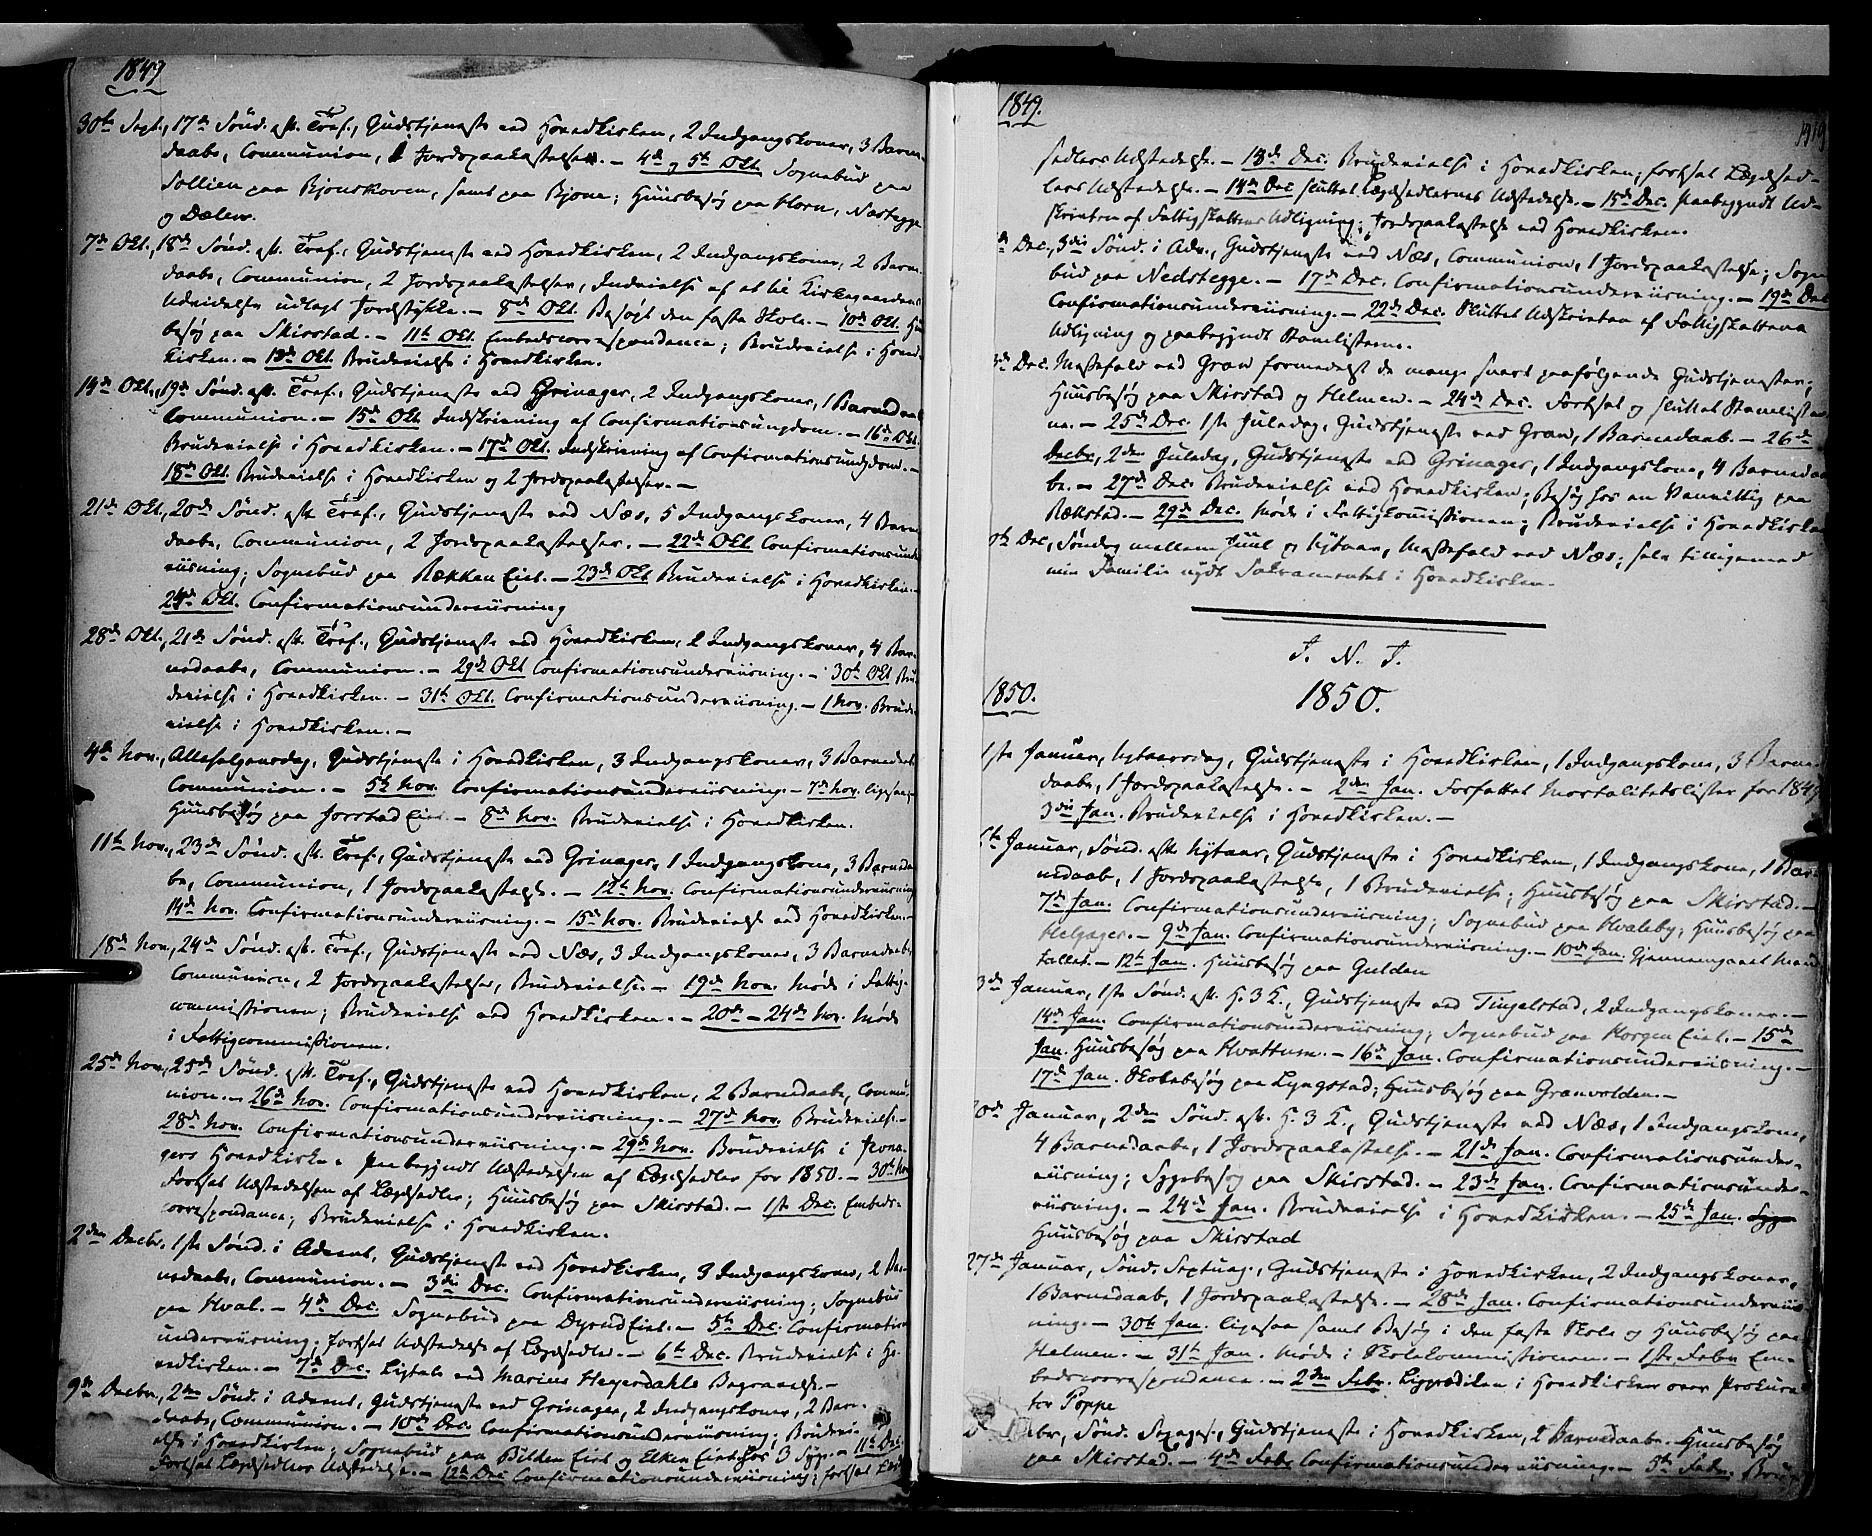 SAH, Gran prestekontor, Ministerialbok nr. 11, 1842-1856, s. 1418-1419